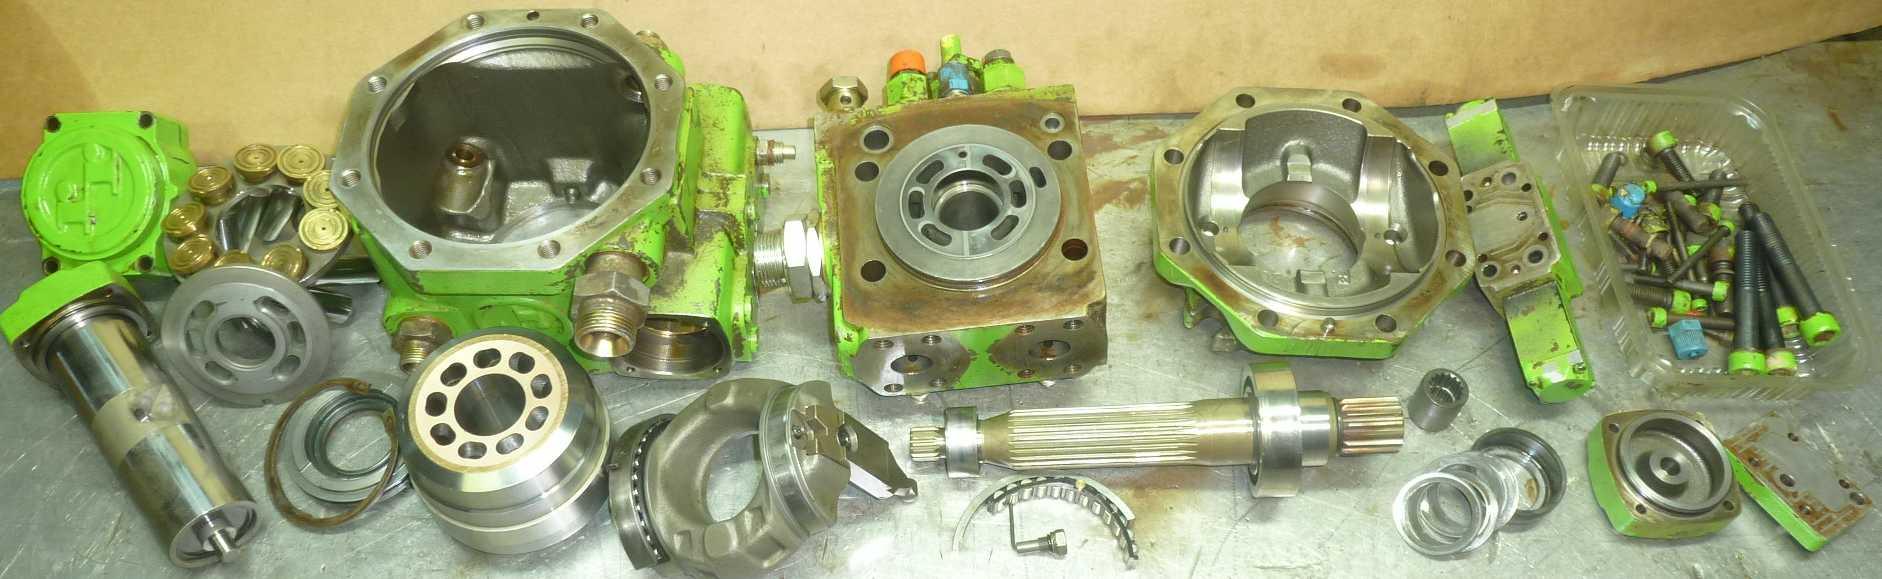 Reparation Pompe-Hydraulique MERLO A4V71 Hydromatik Rexroth